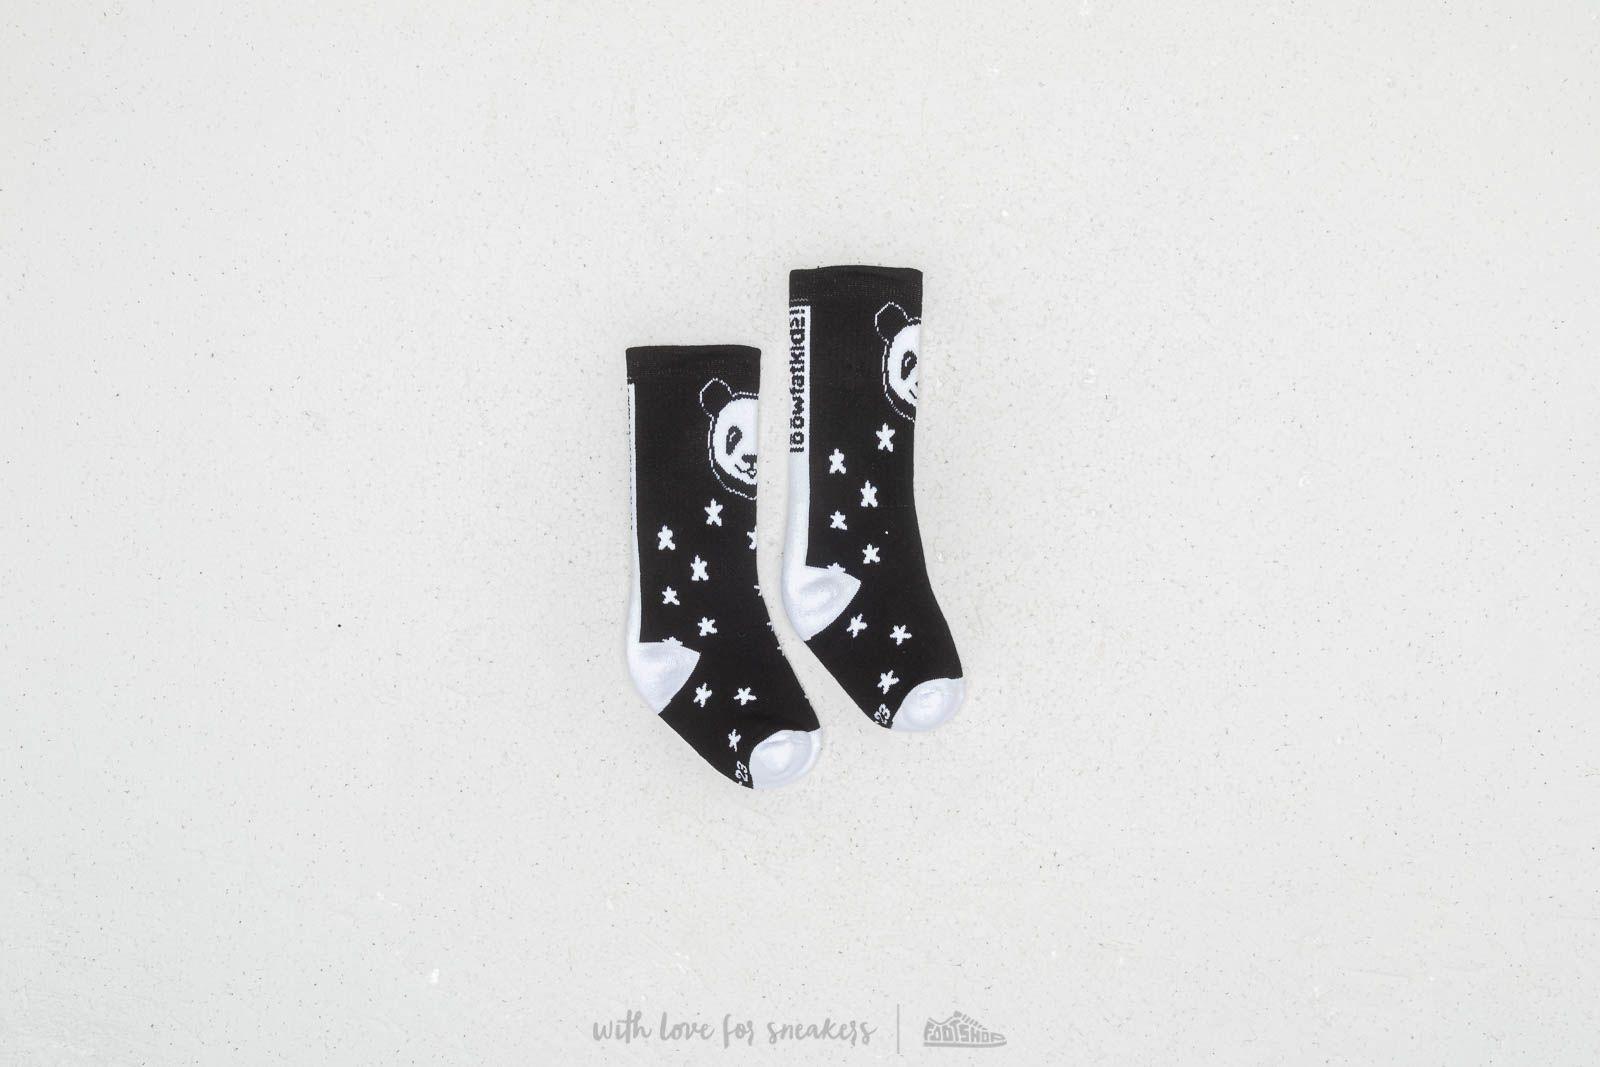 LoowFAT KIDS Panda Socks Black za skvelú cenu 8 € kúpite na Footshop.sk